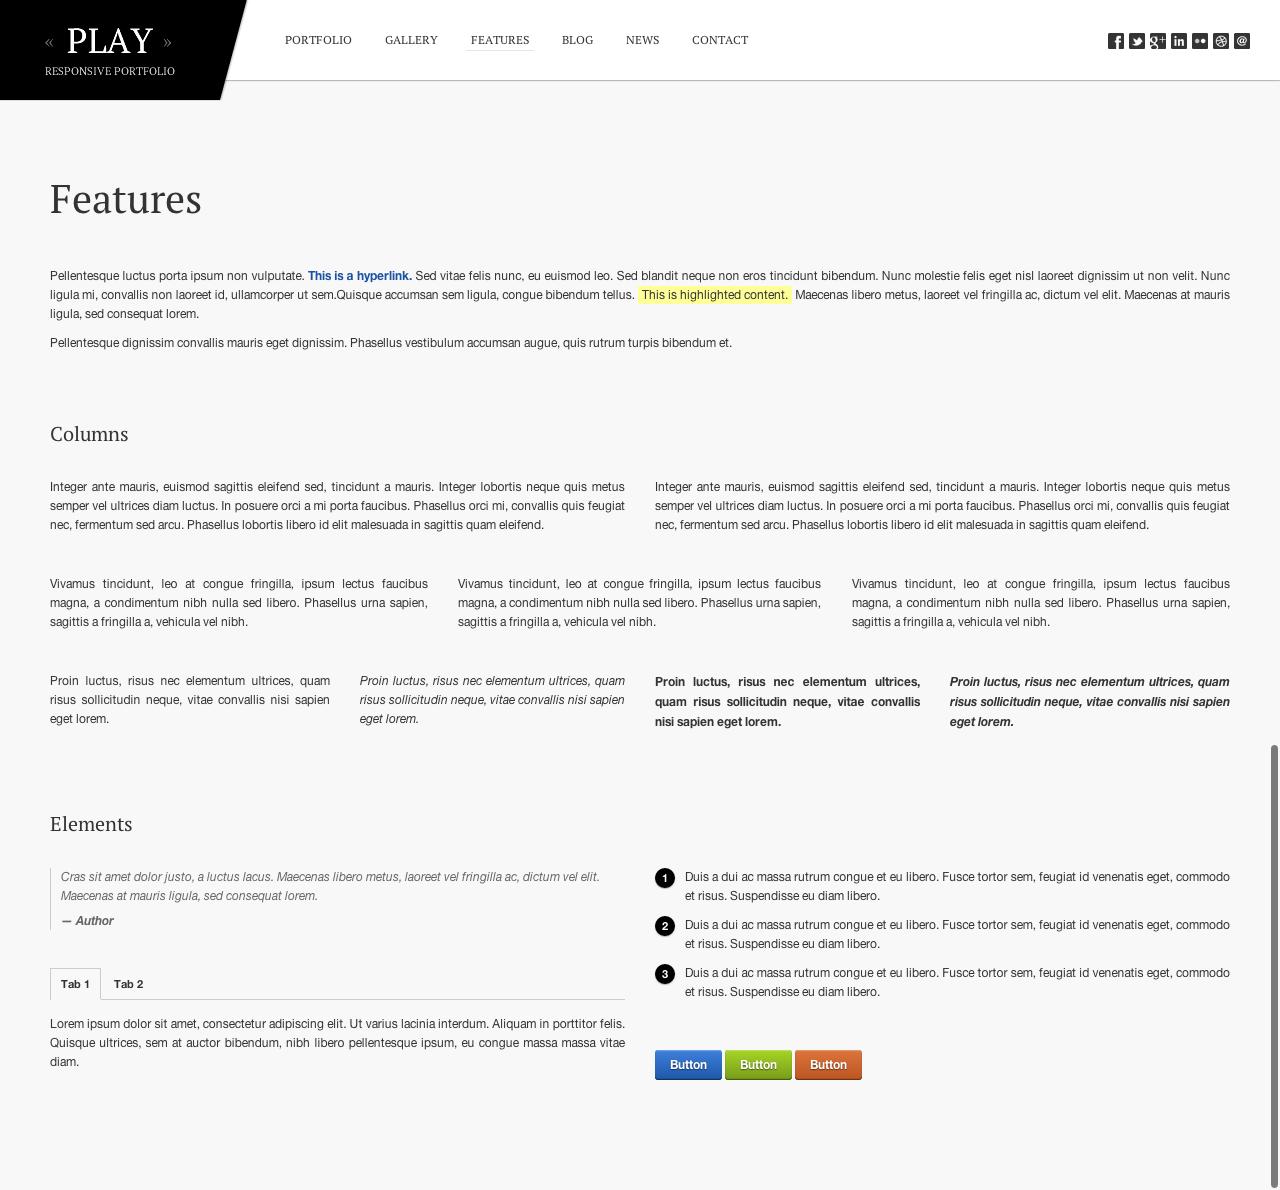 Play - Responsive Portfolio